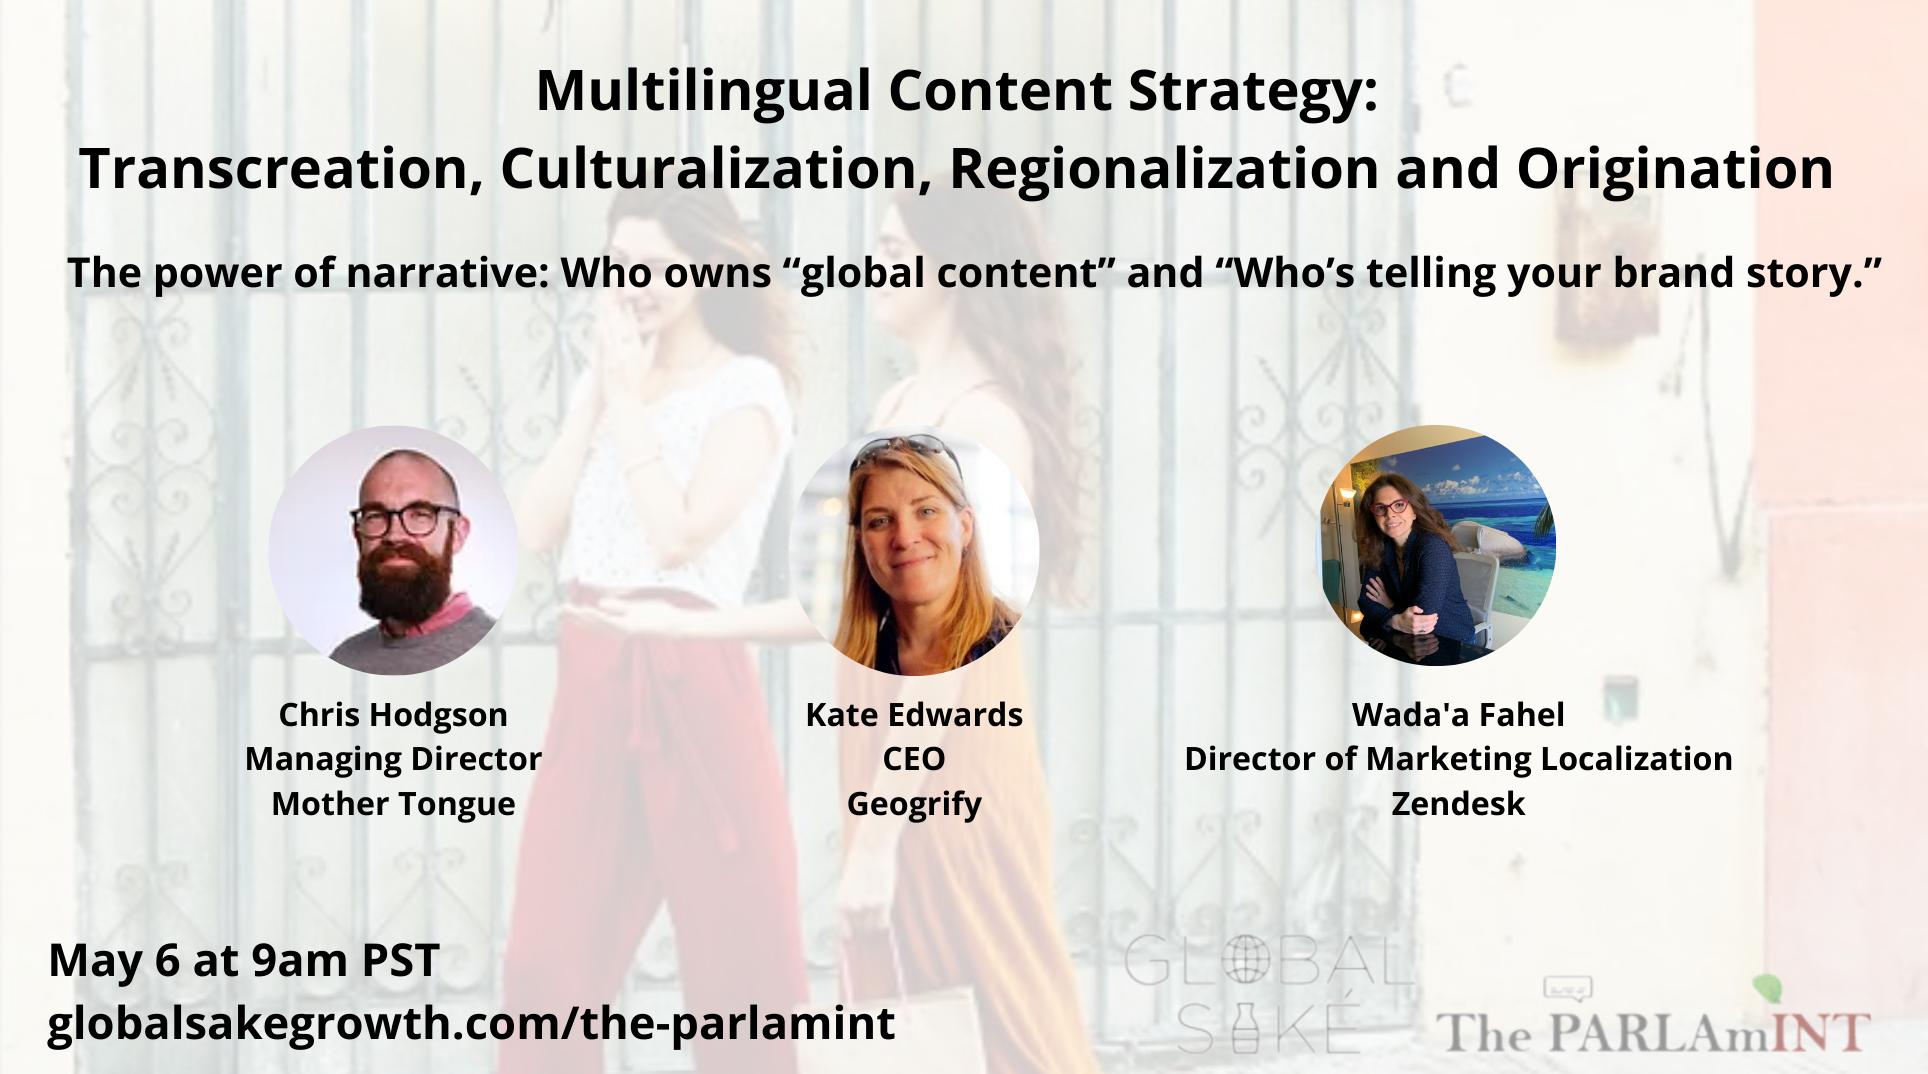 GlobalSaké The PARLAmINT: Multilingual content strategy: transcreation, culturalization, regionalization and local content origination